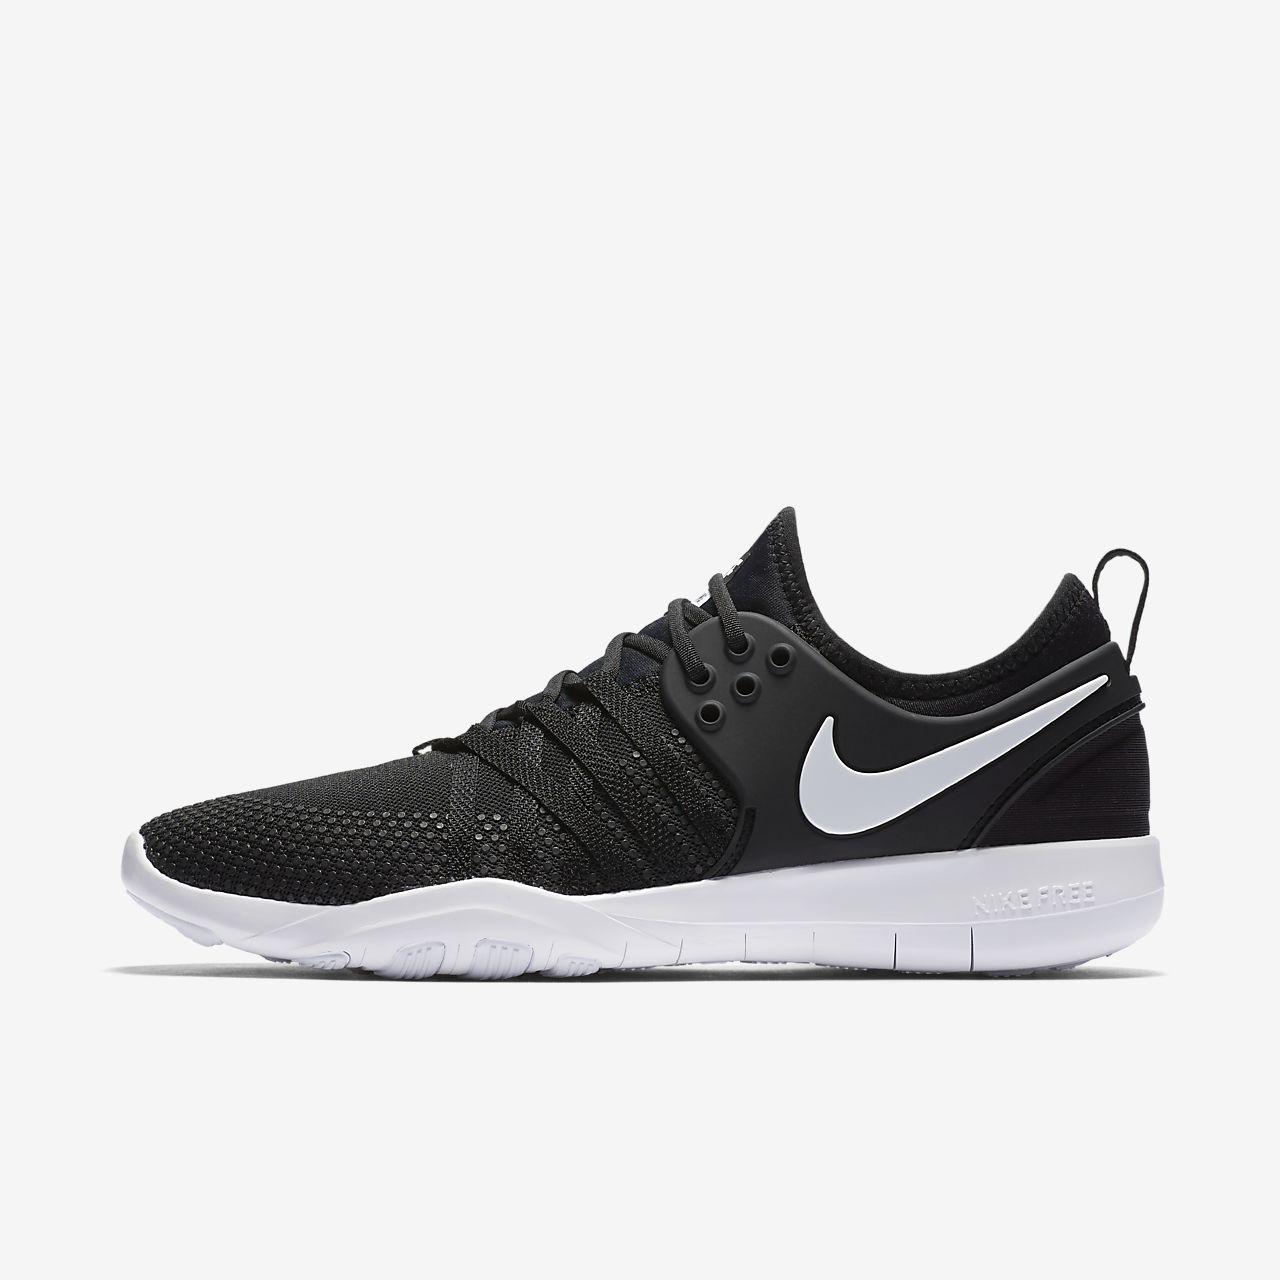 promo code 0bb6d 3fd45 Nike Free TR 7 Women's Training Shoe